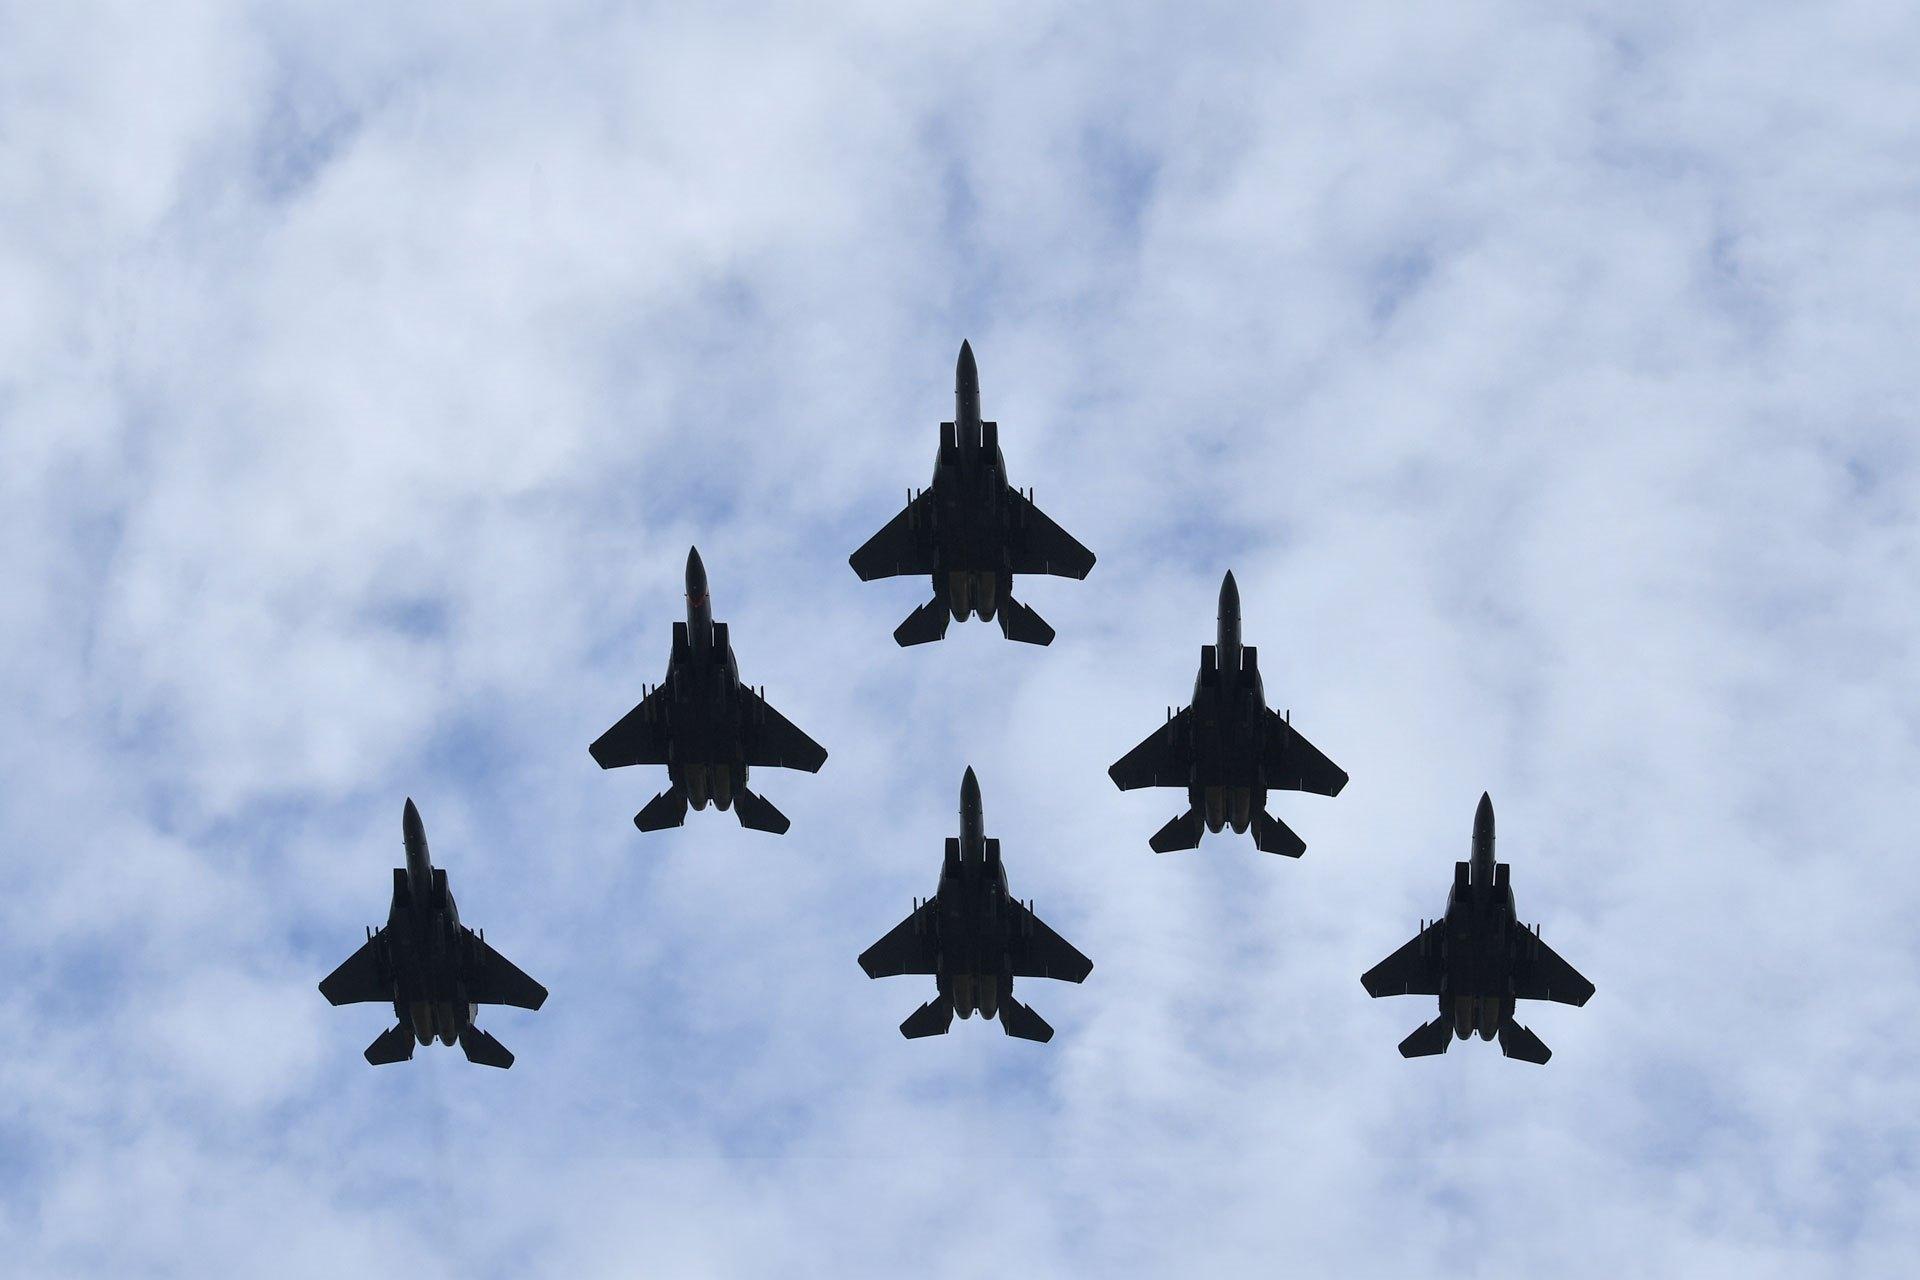 https://www.mindef.gov.sg/web/wcm/connect/pioneer/10a149f9-df5b-4f72-9fac-548449e91e68/F-15SG-fighter-jets.jpg?MOD=AJPERES&CACHEID=ROOTWORKSPACE.Z18_1QK41482LG0G10Q8NM8IUA1051-10a149f9-df5b-4f72-9fac-548449e91e68-mme7Dnt